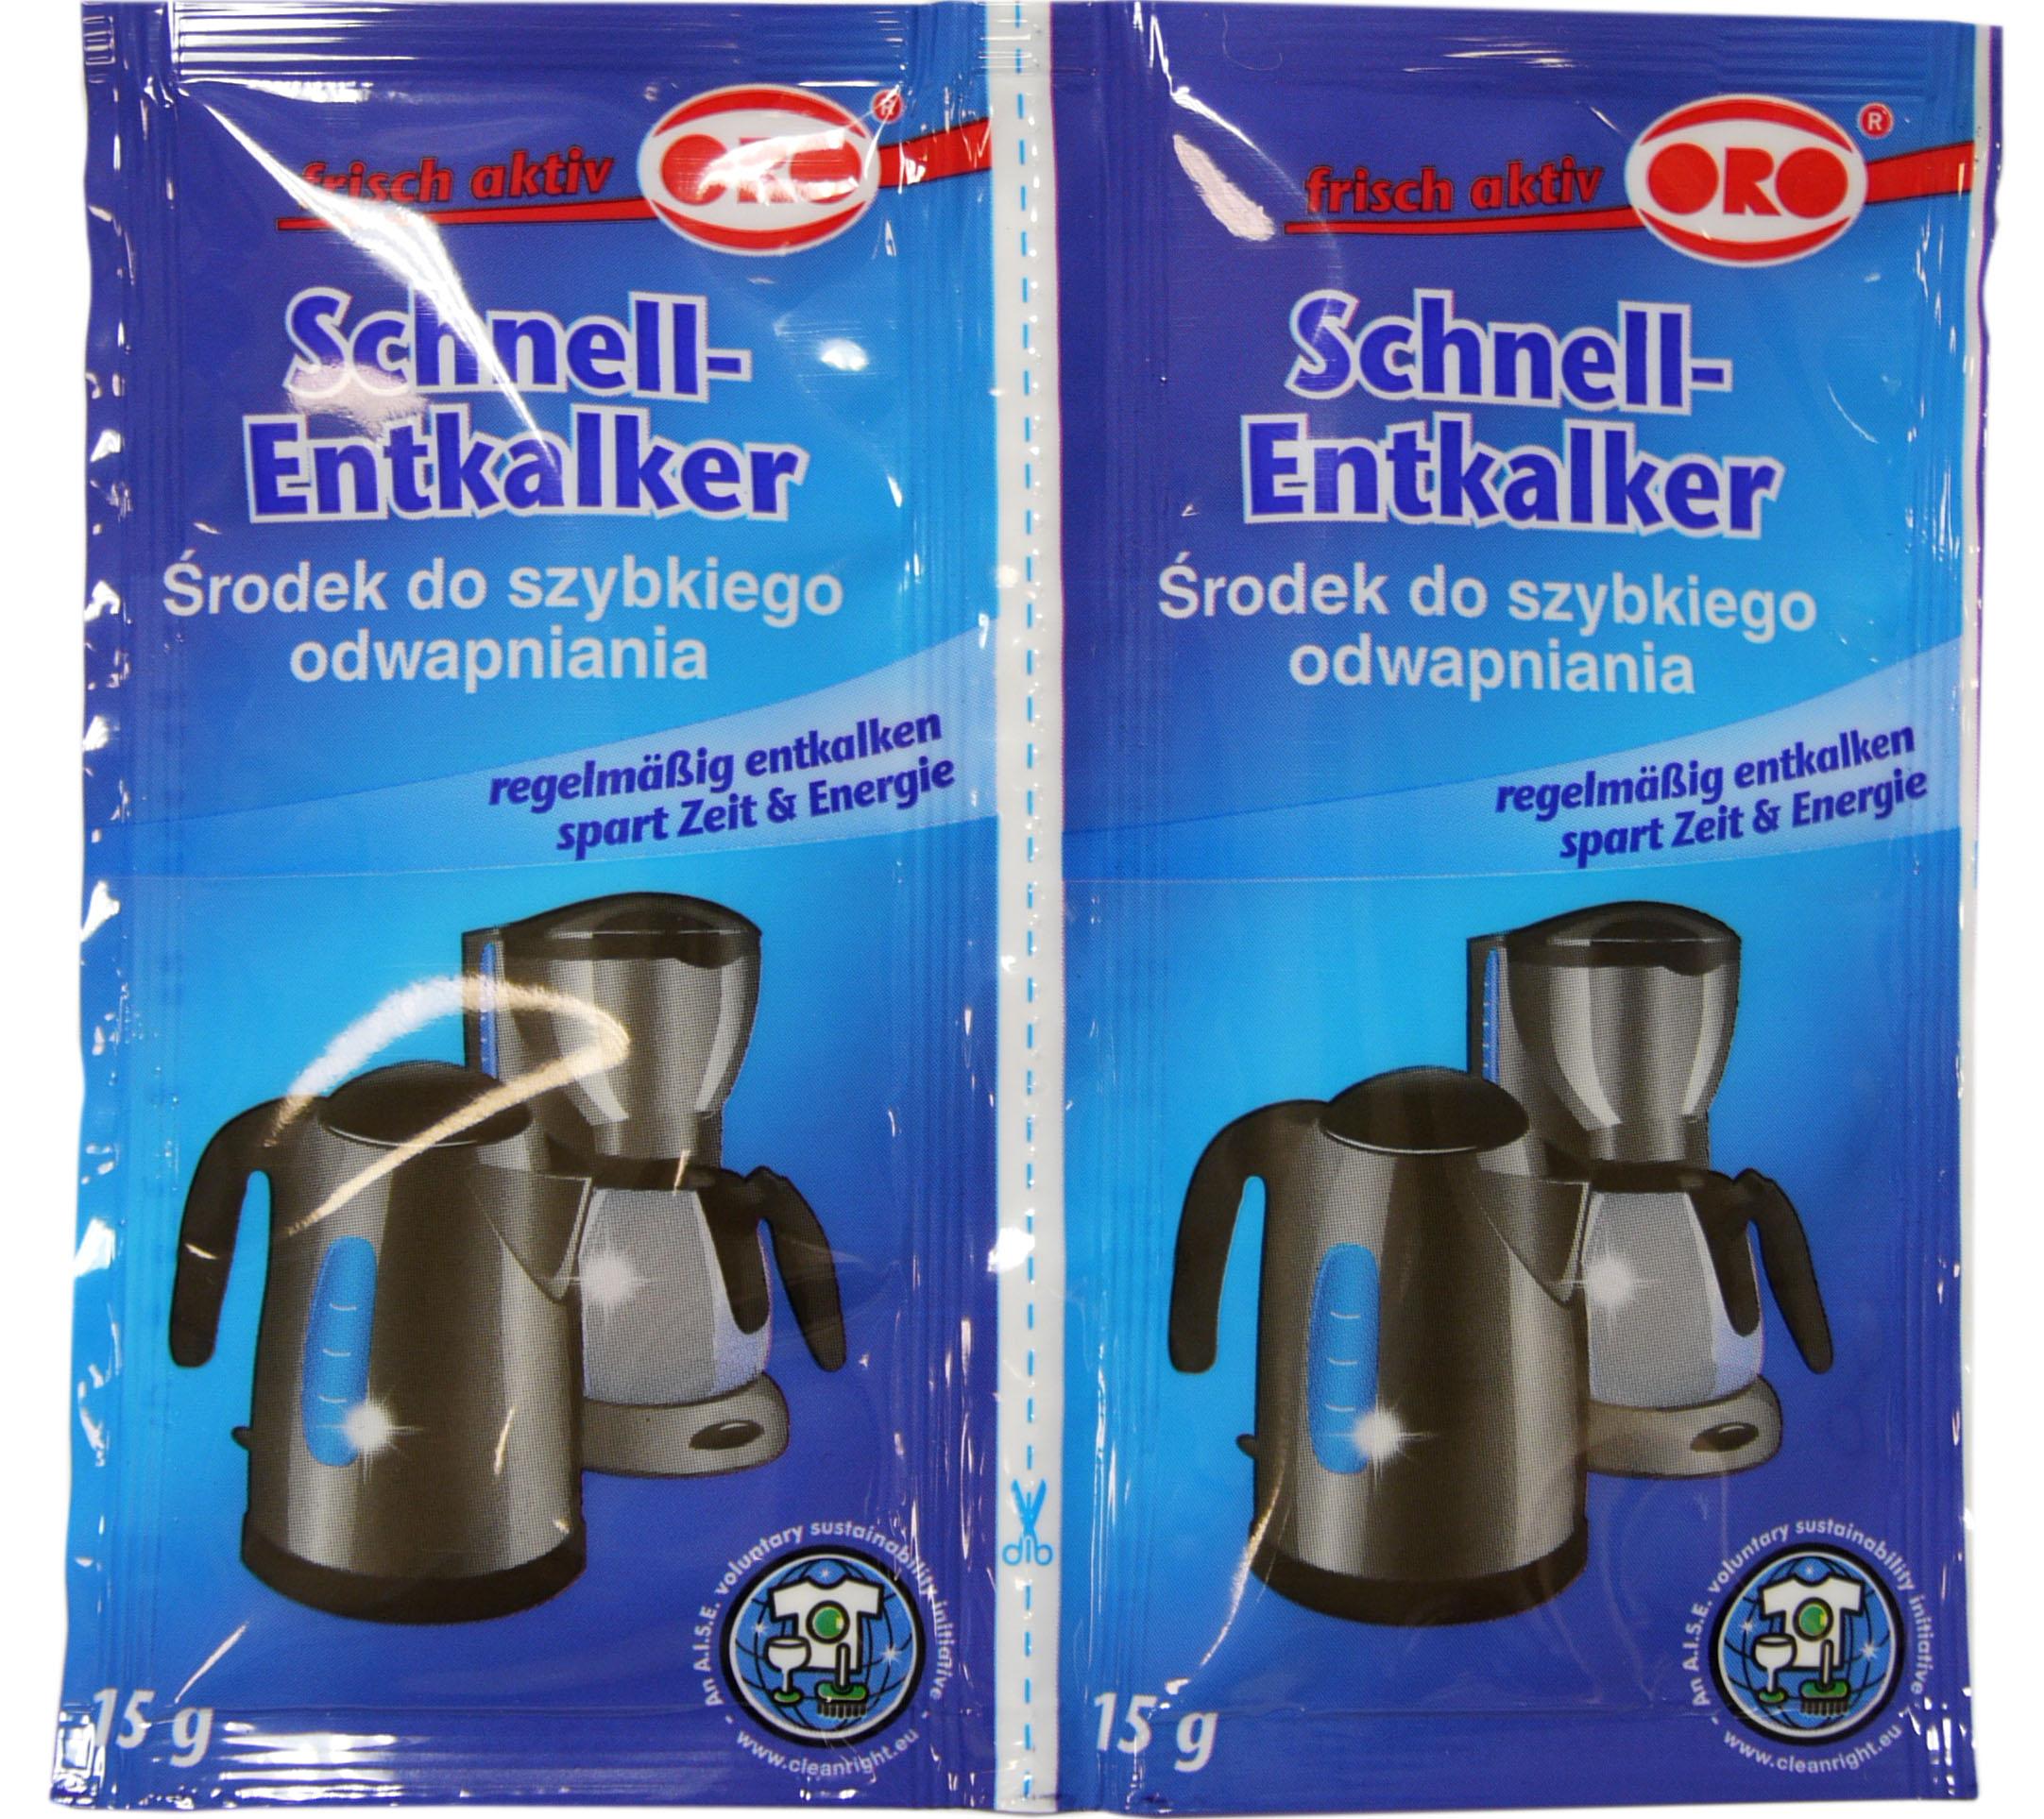 02419 - CITRO Anti-Kalk Bio-Entkalker 2 x 17 g